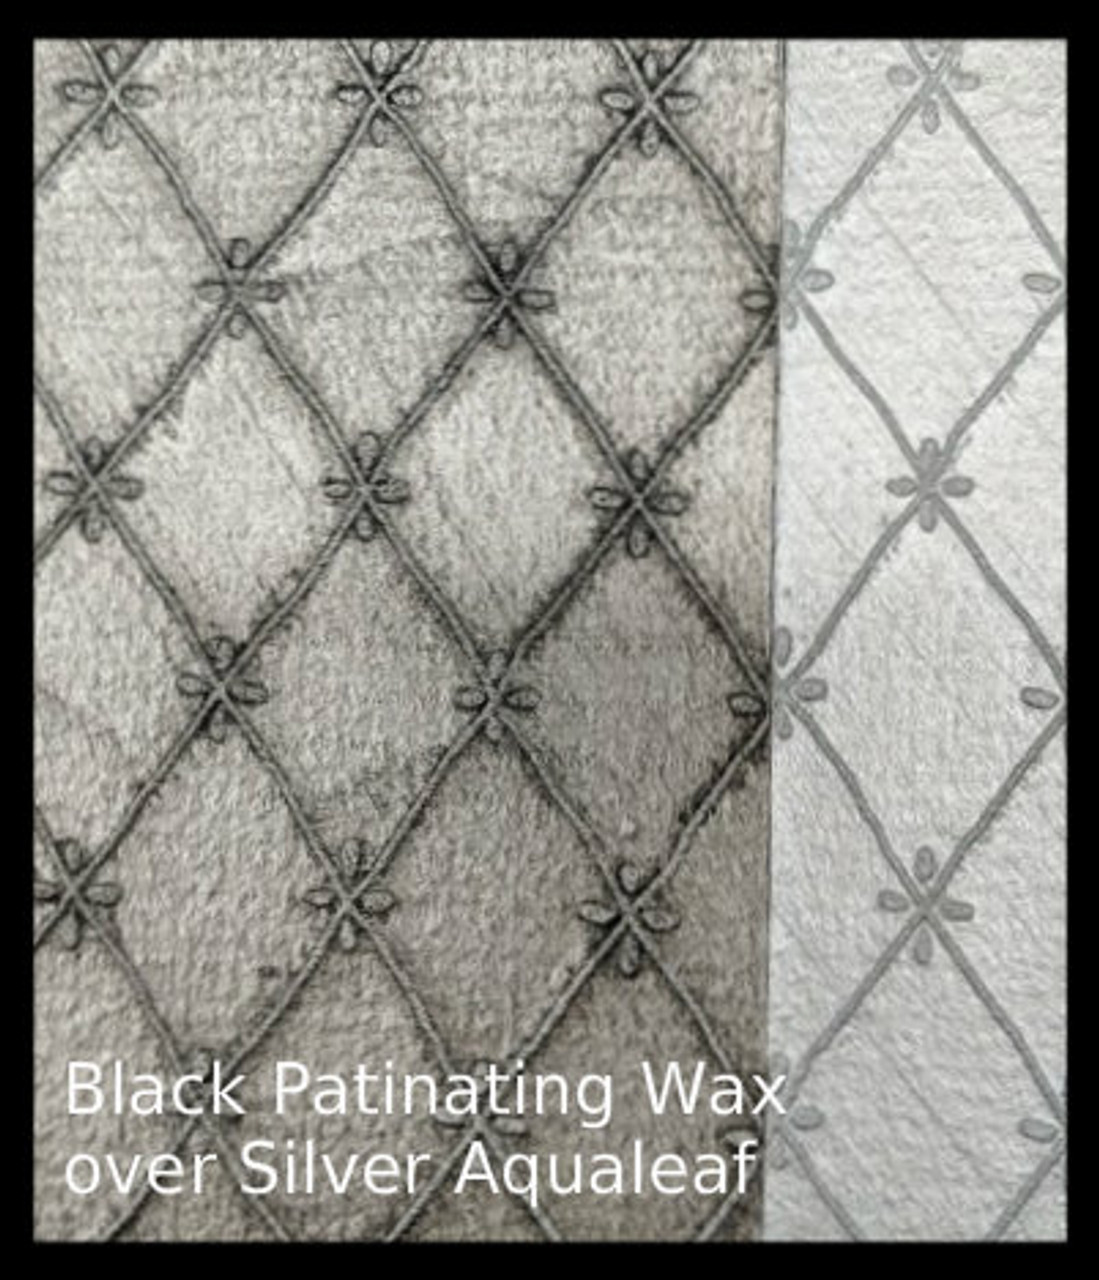 Black Patinating Wax over Silver Aqualeaf